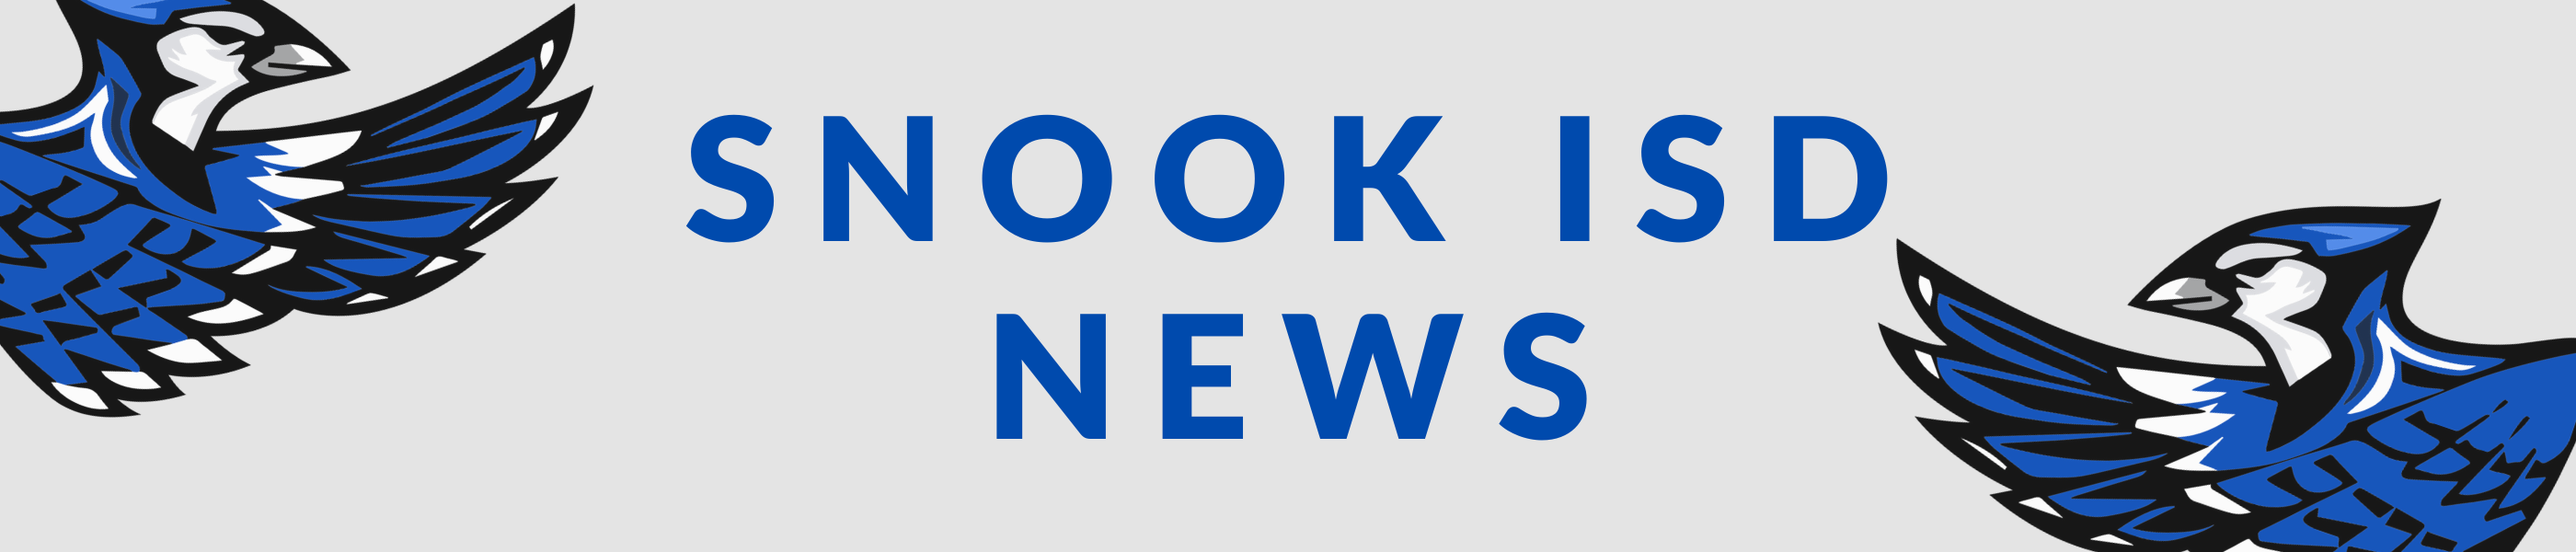 Snook ISD News